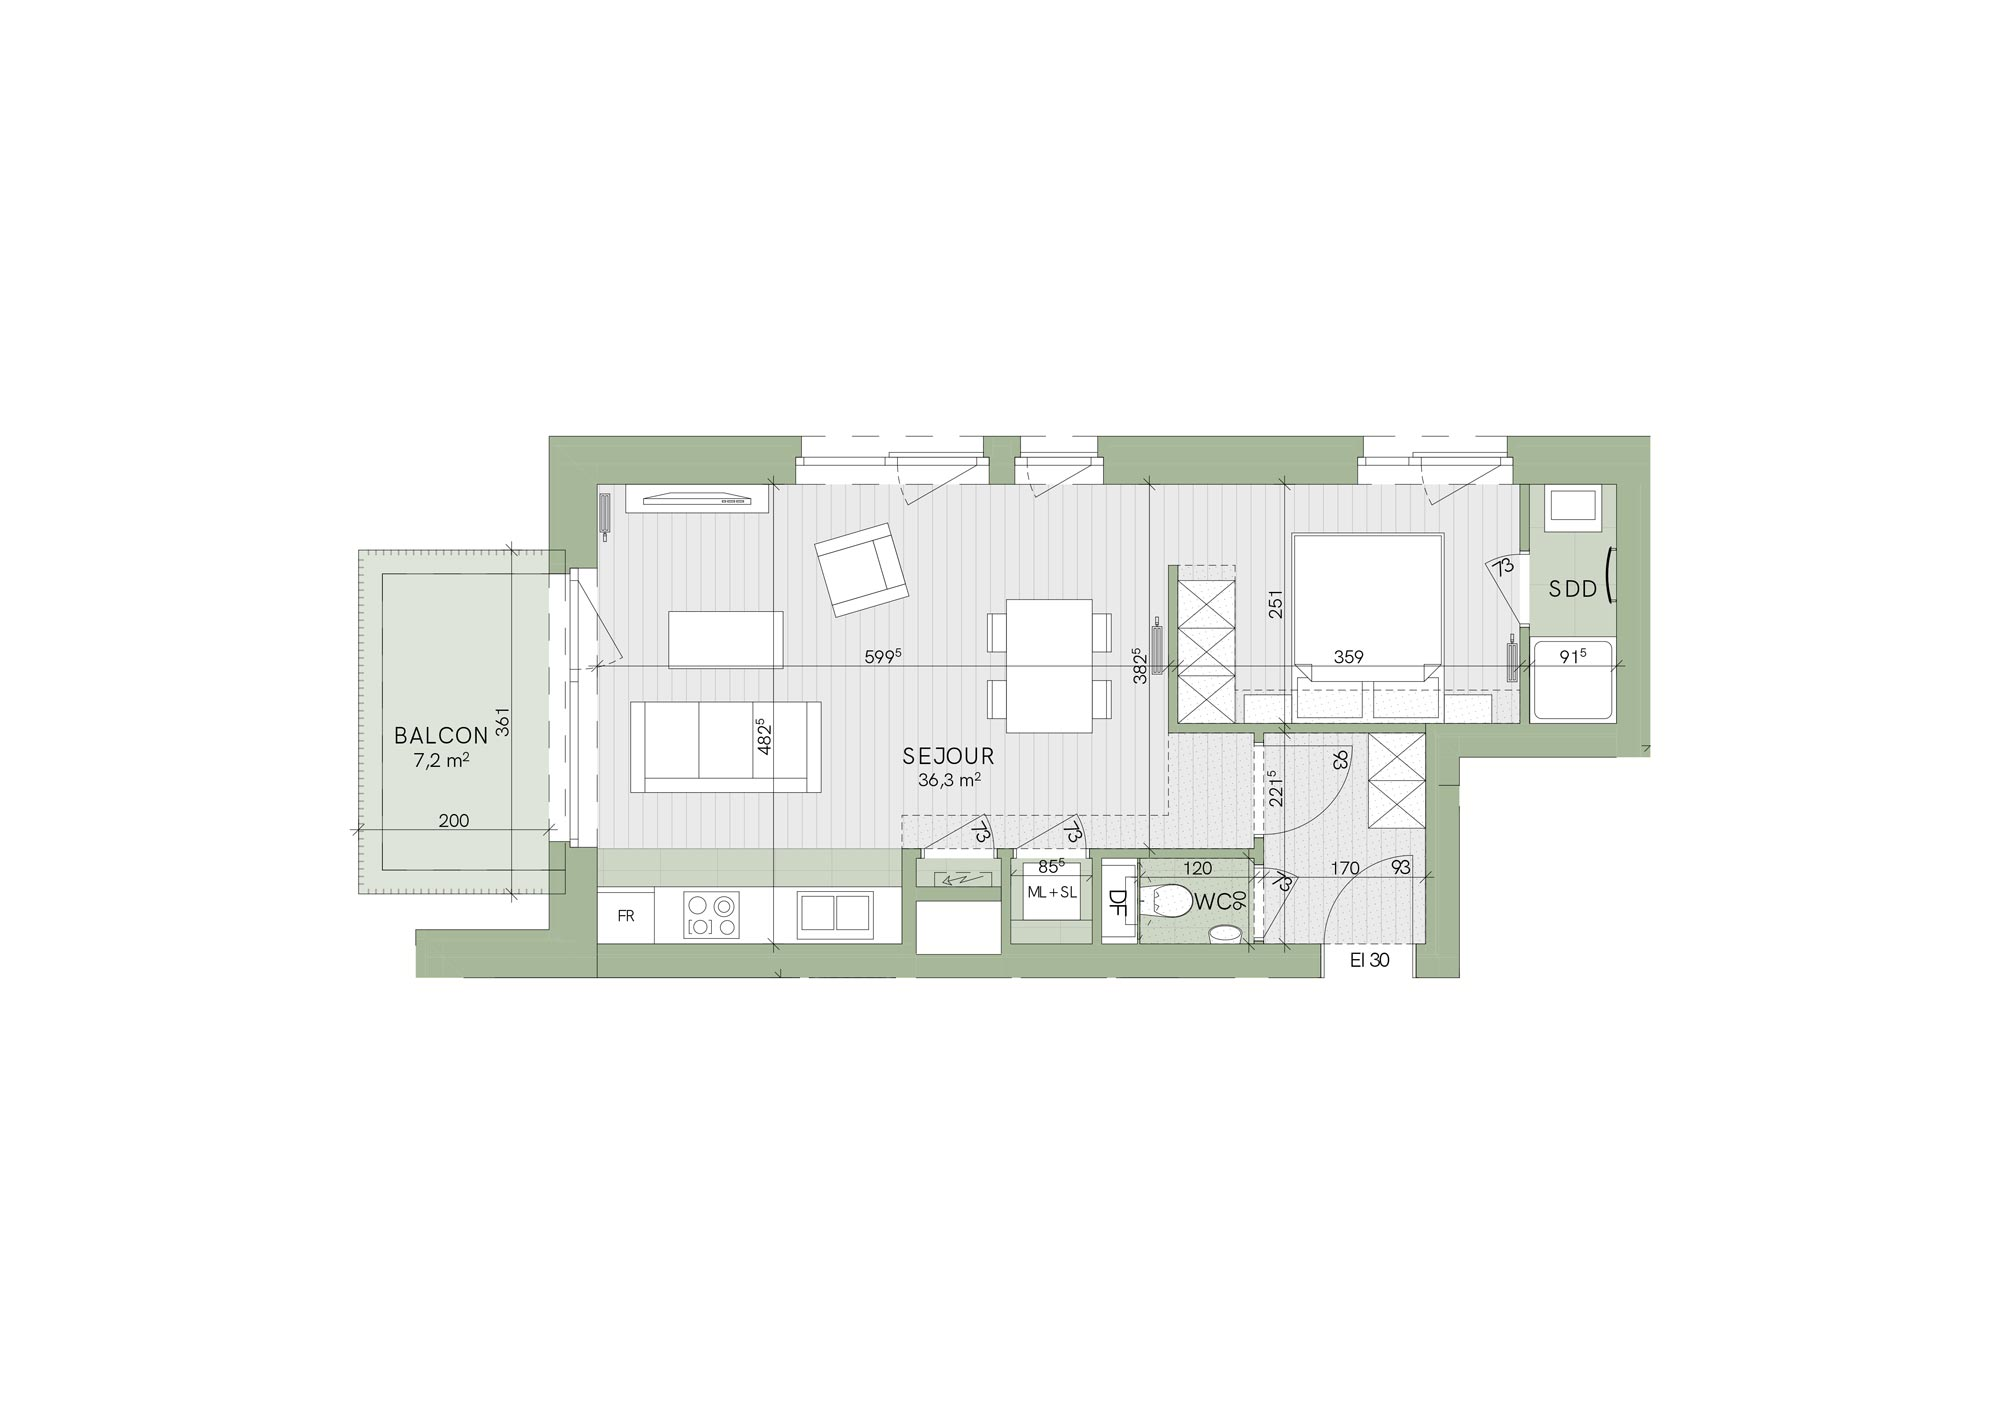 SoStockel - Une Chambre